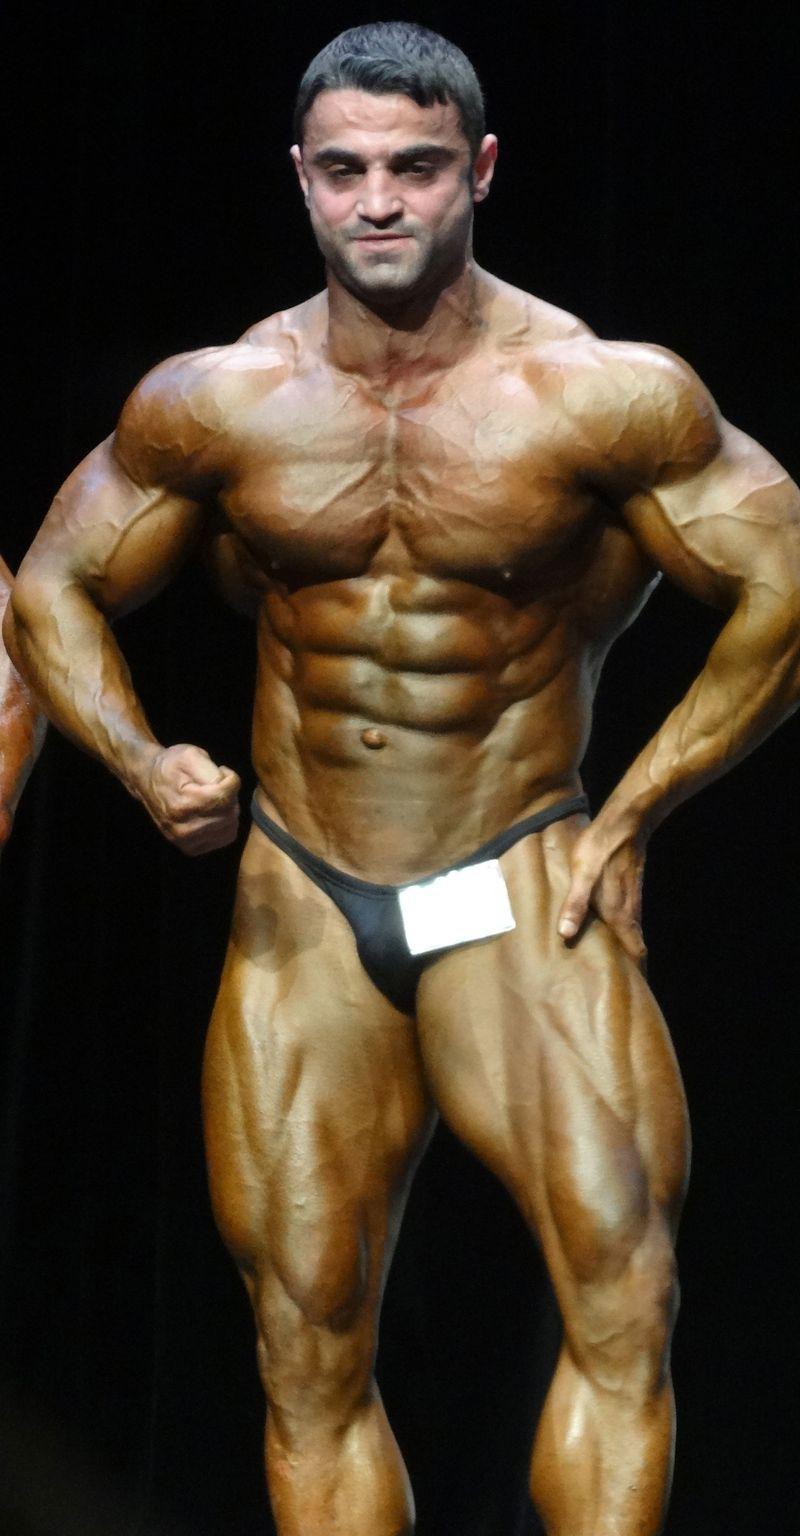 Massive bodybuilder DSC02090